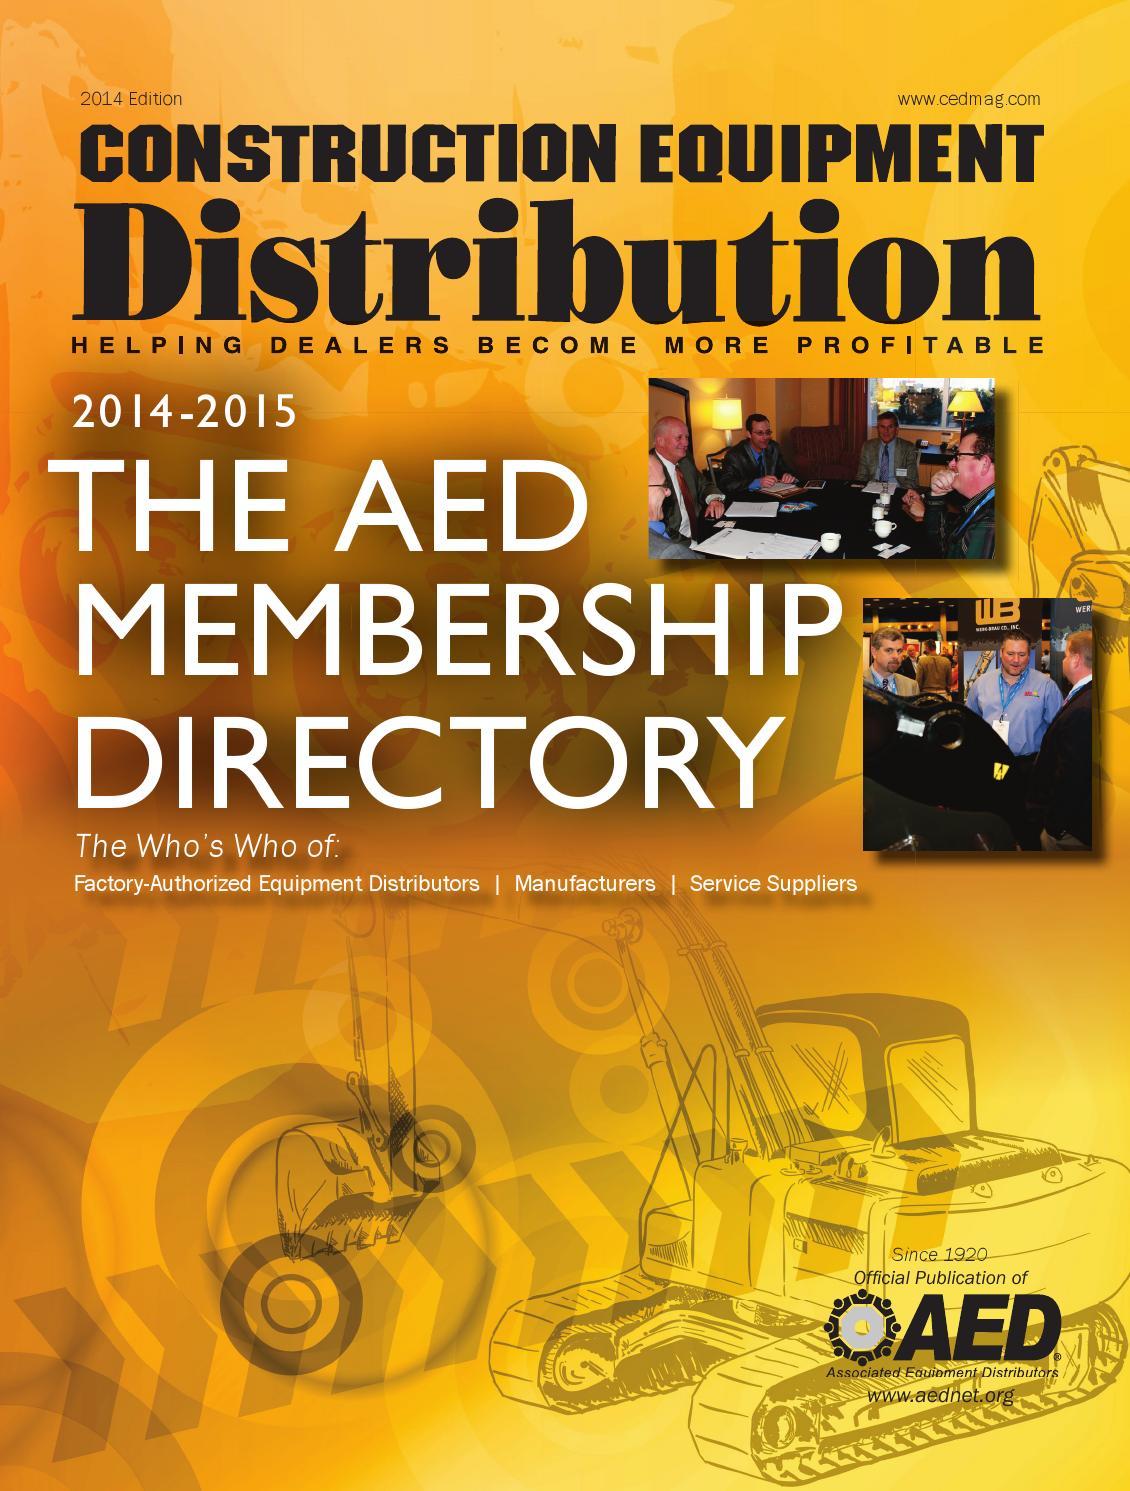 347645 may 2014 by Associated Equipment Distributors - issuu b61fb953c3ac